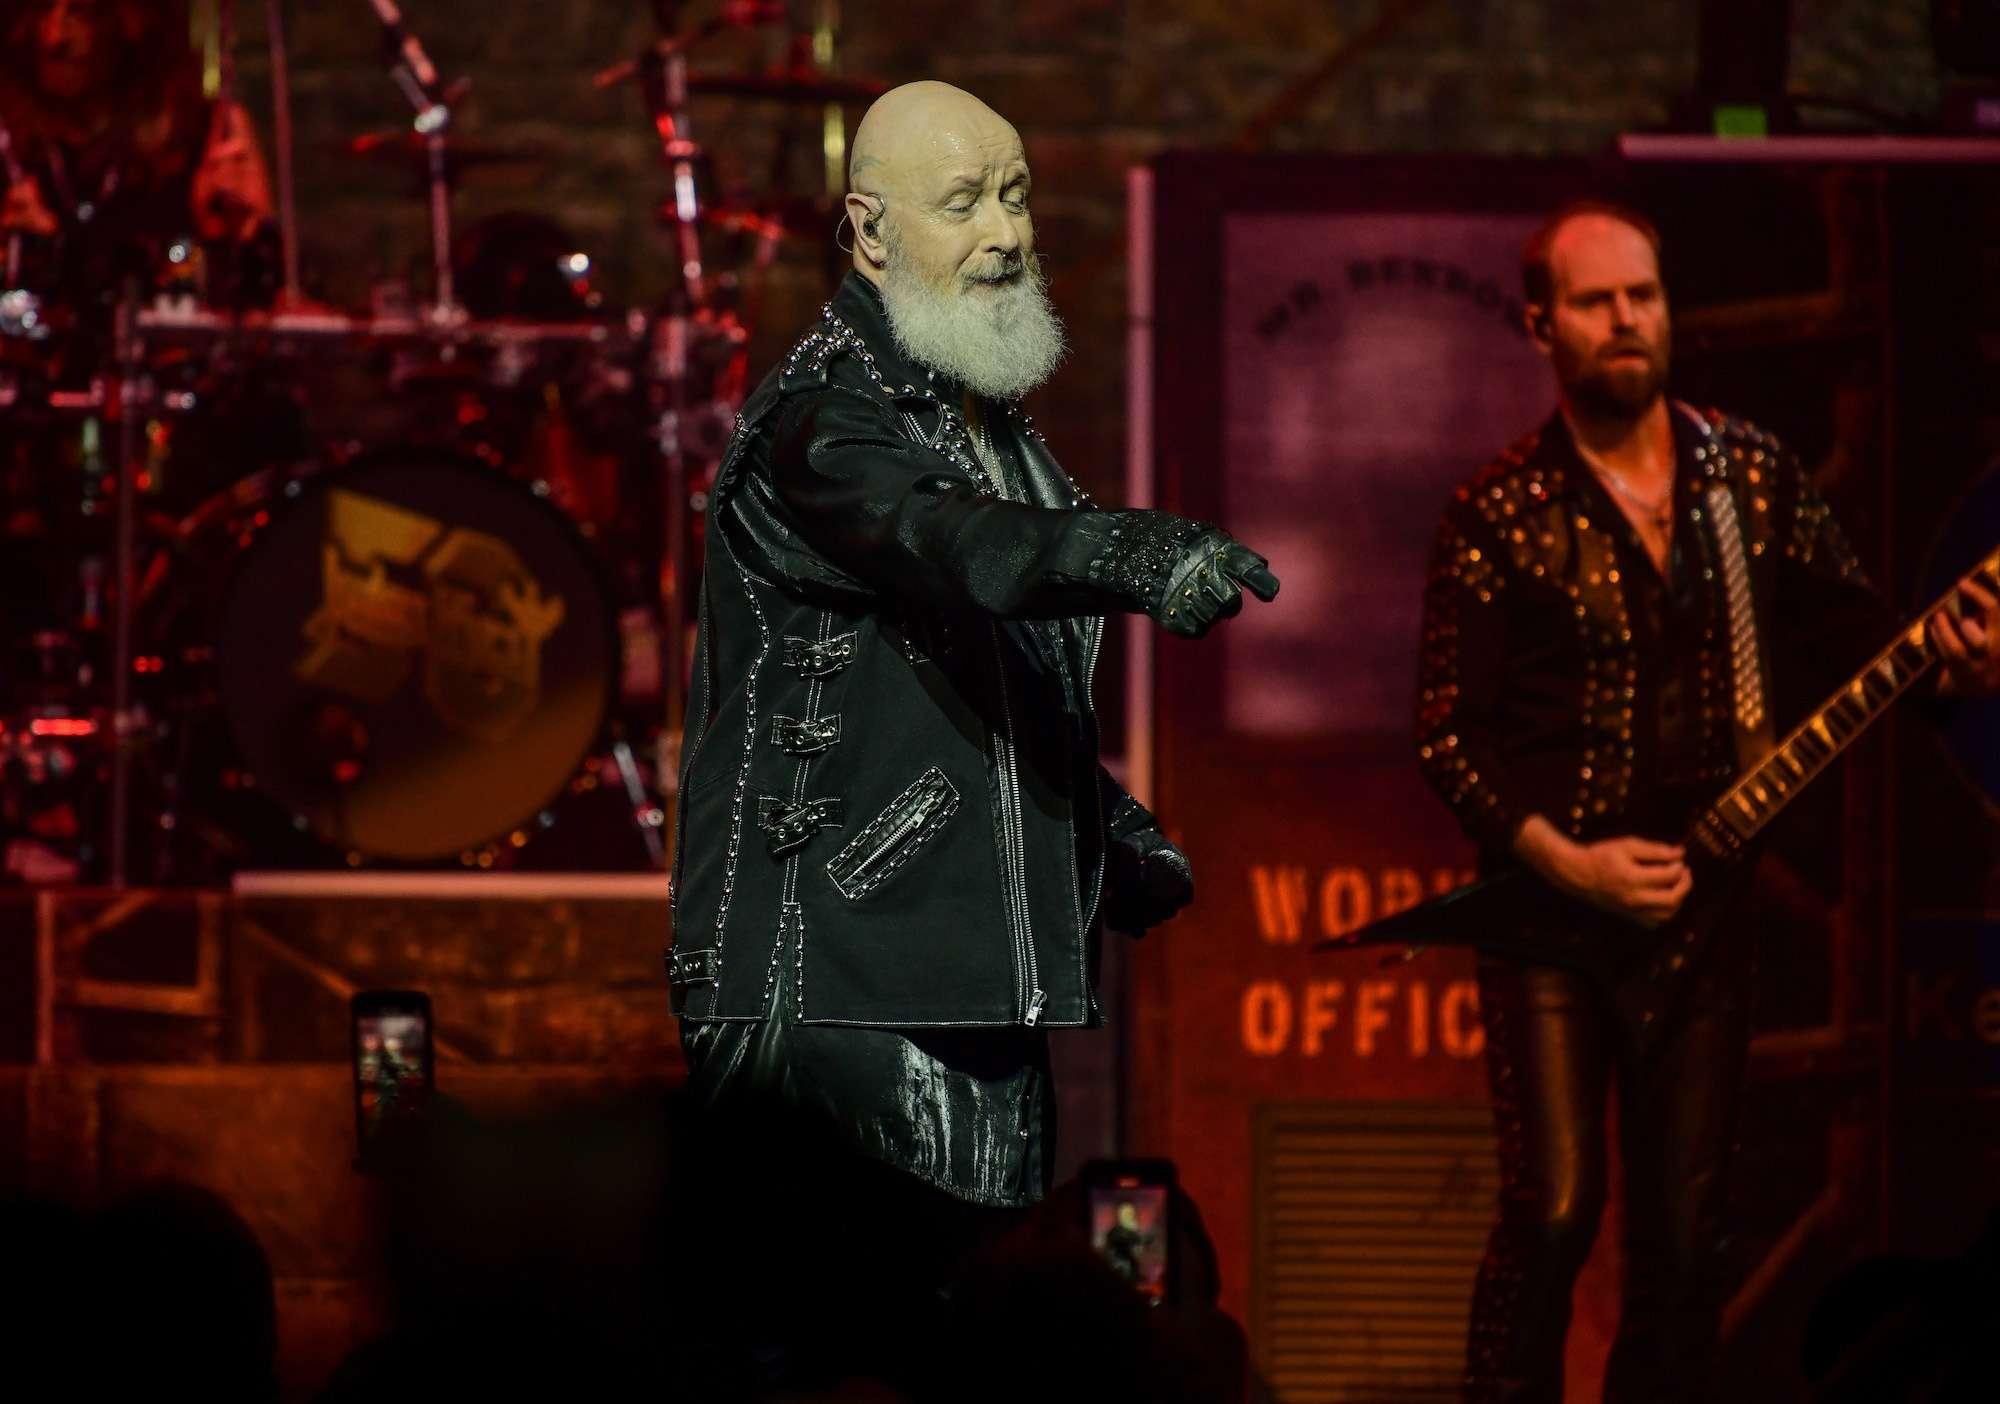 Judas Priest Live at Rosemont Theatre [GALLERY] 12